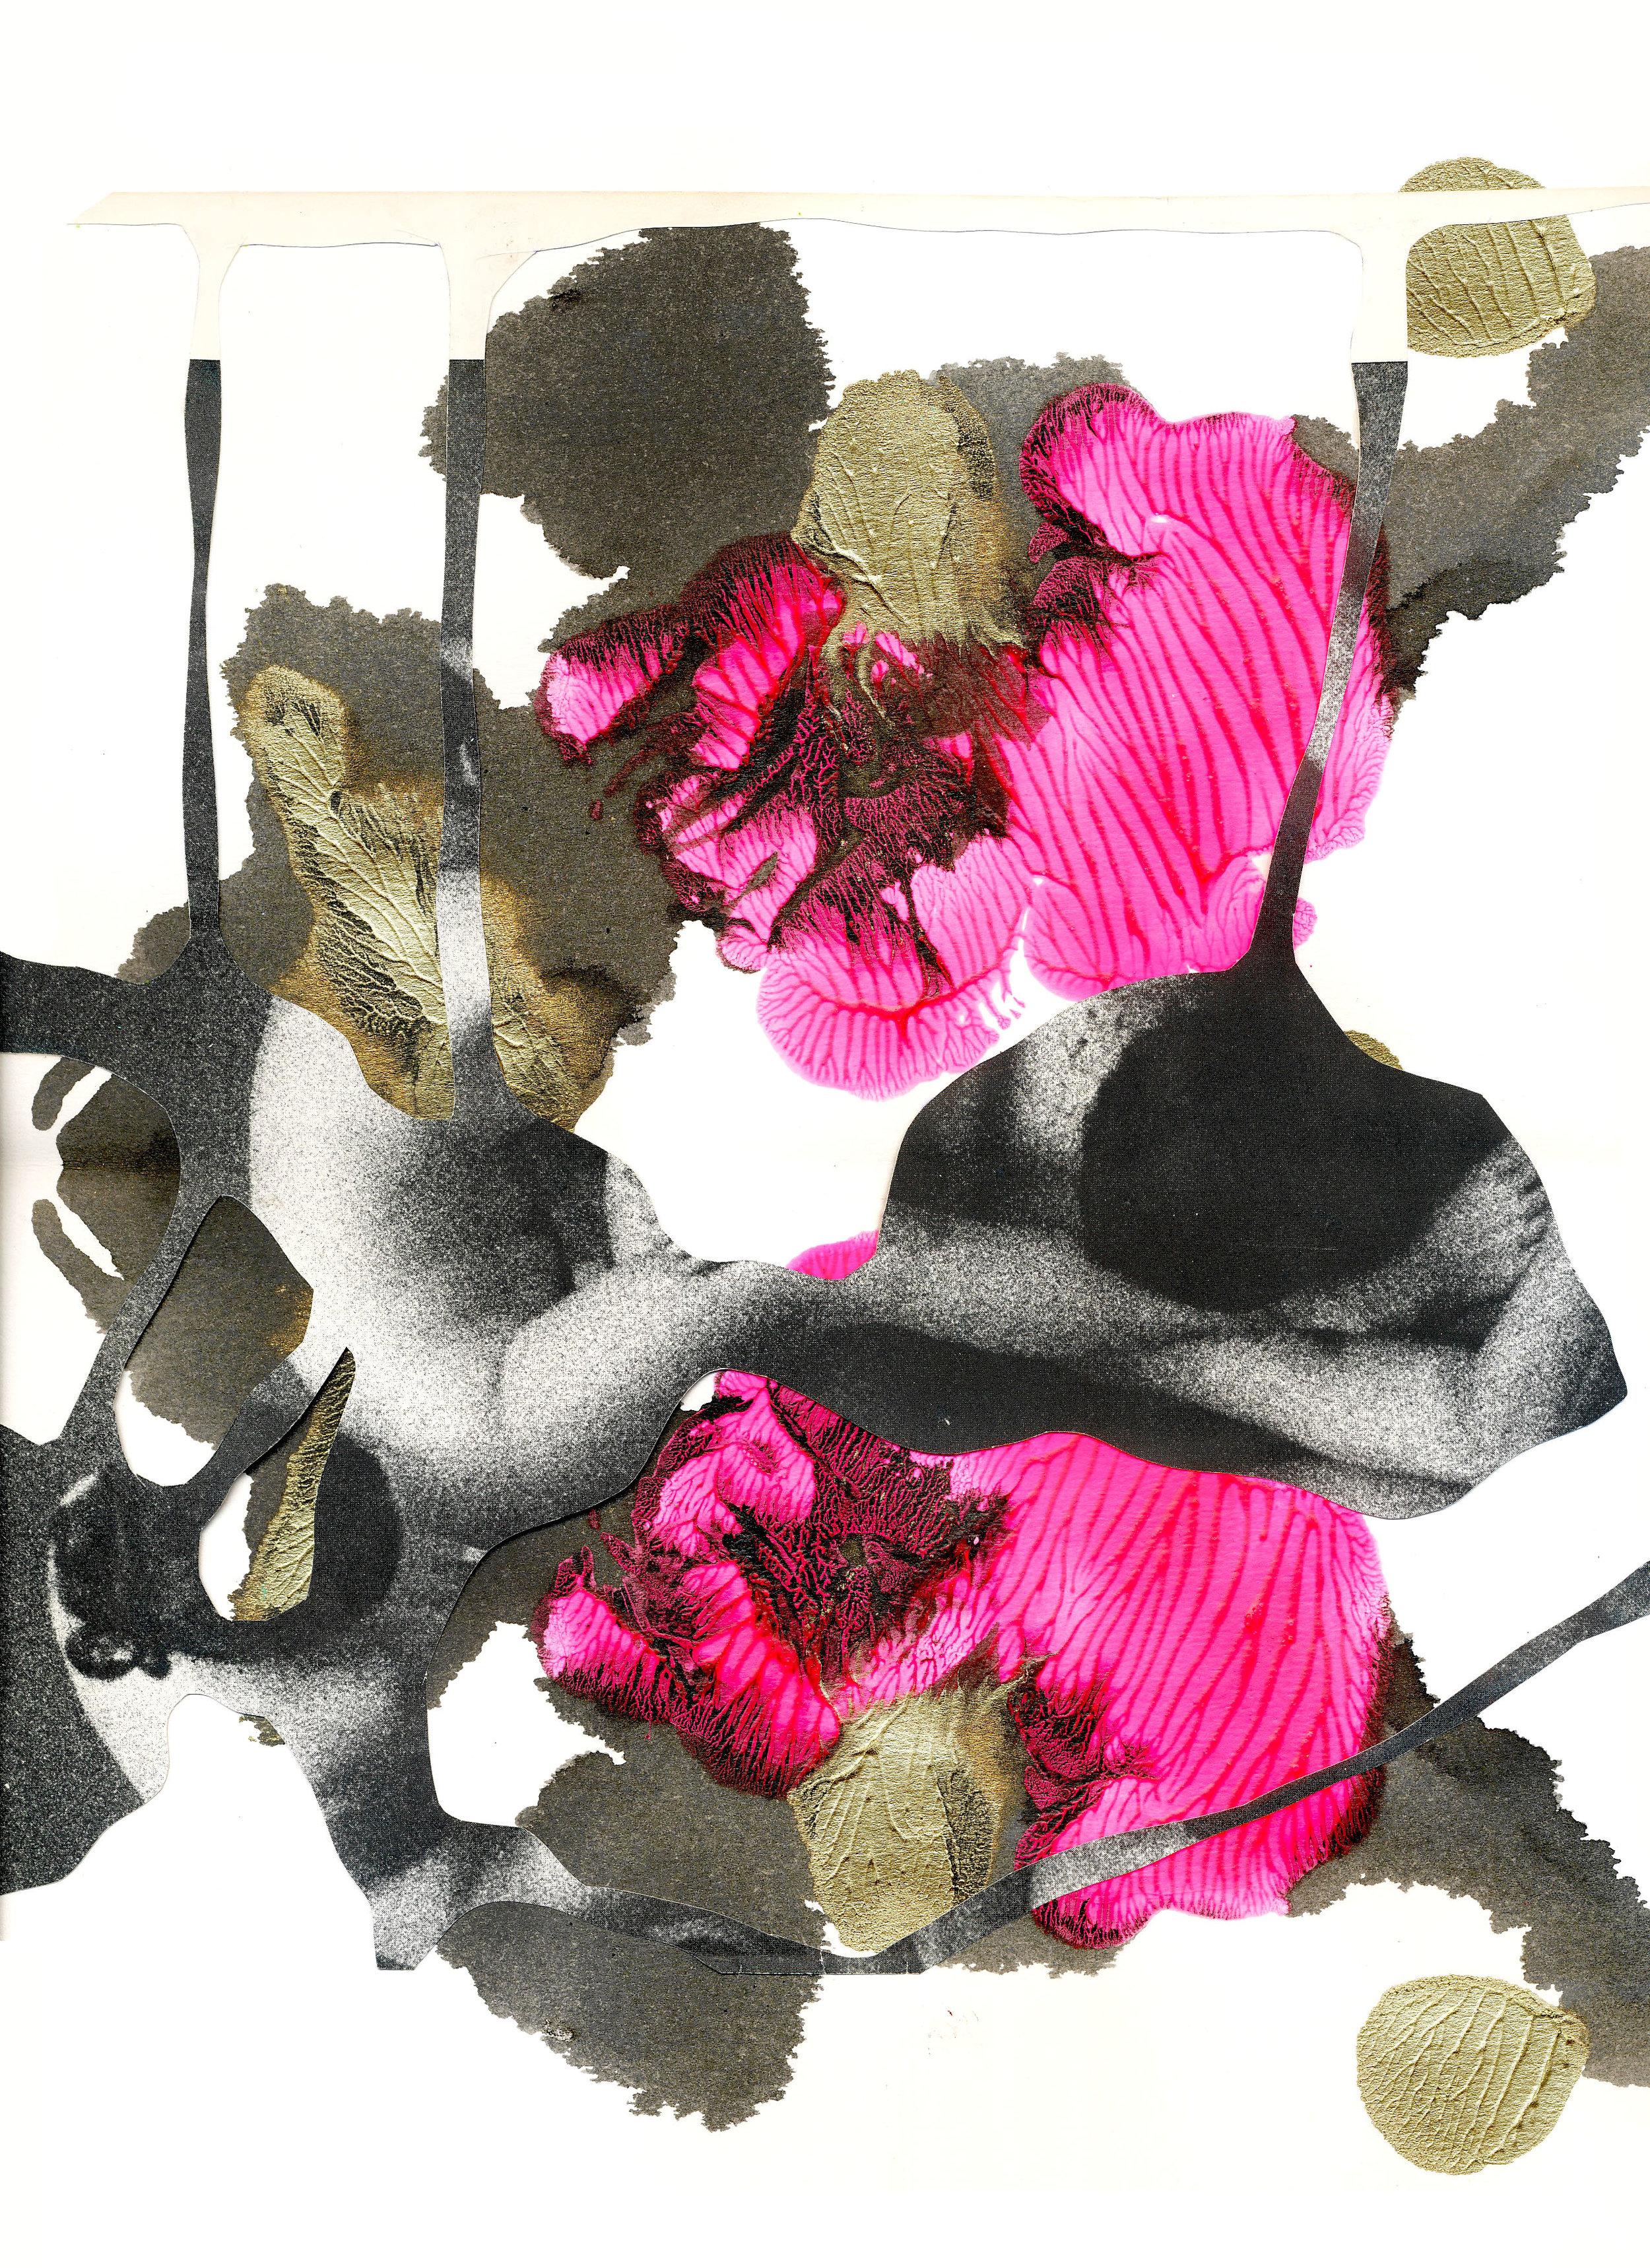 Untitled-Scanned-22 (6).jpg